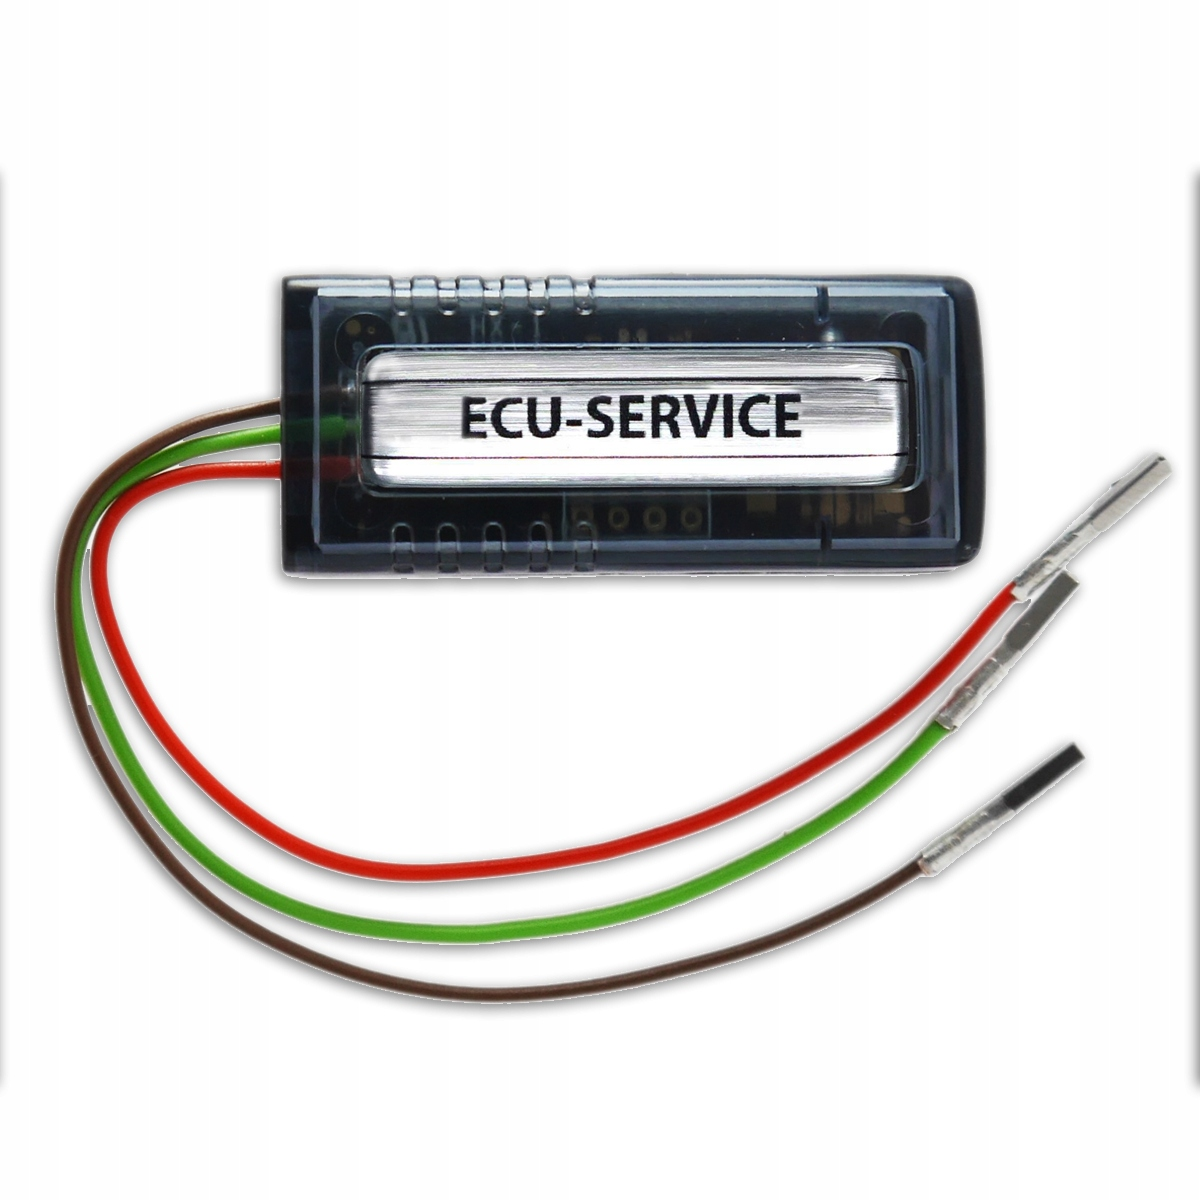 эмулятор коврики bmw e60 e88 e90 e91 e92 e93 контакты